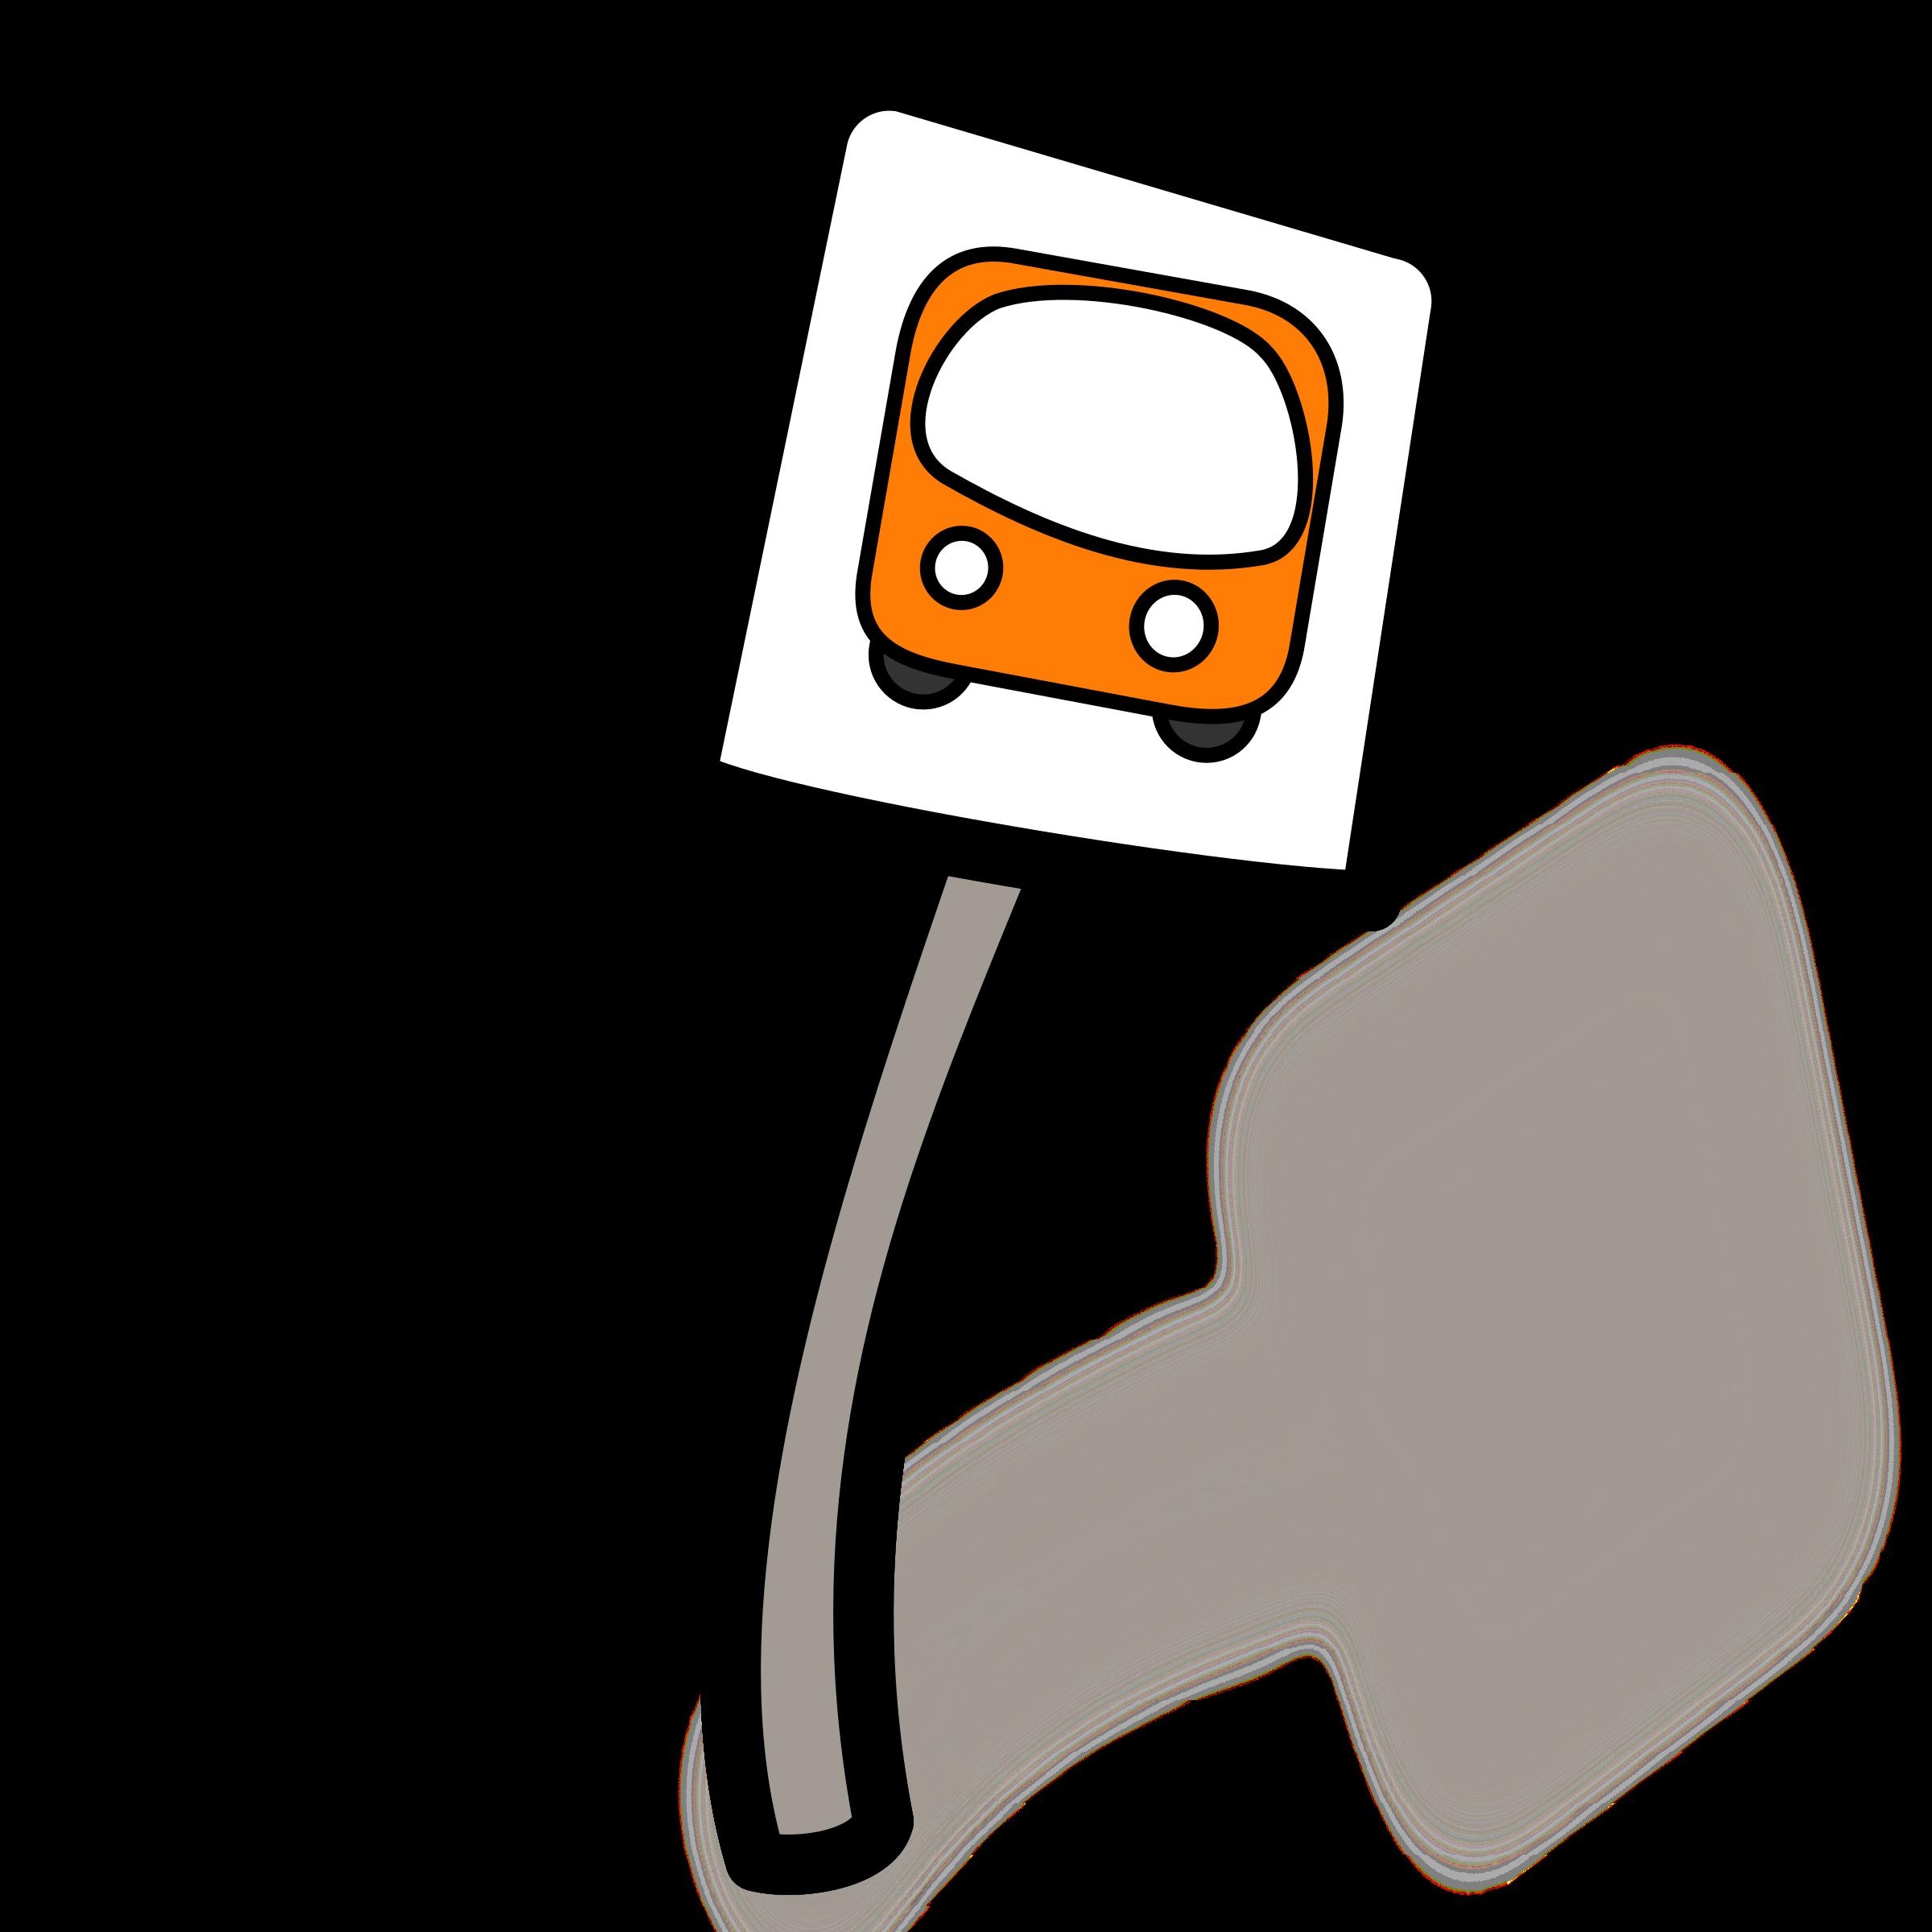 Bus Stop Clip Art.